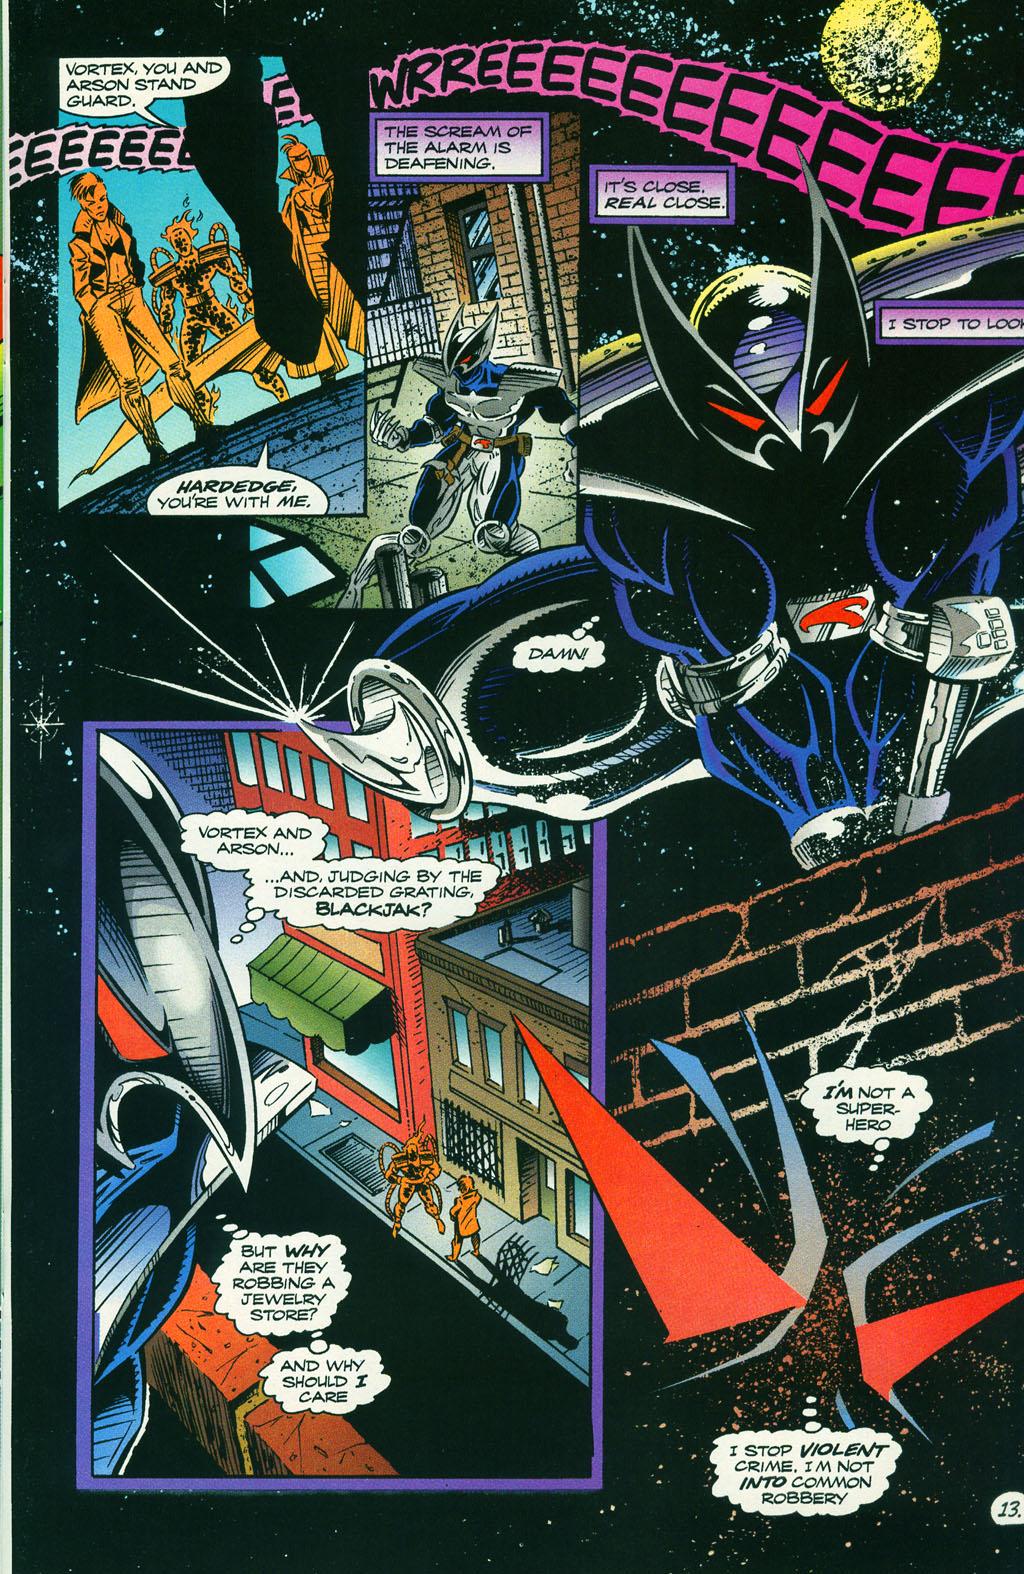 Read online ShadowHawk comic -  Issue #5 - 17